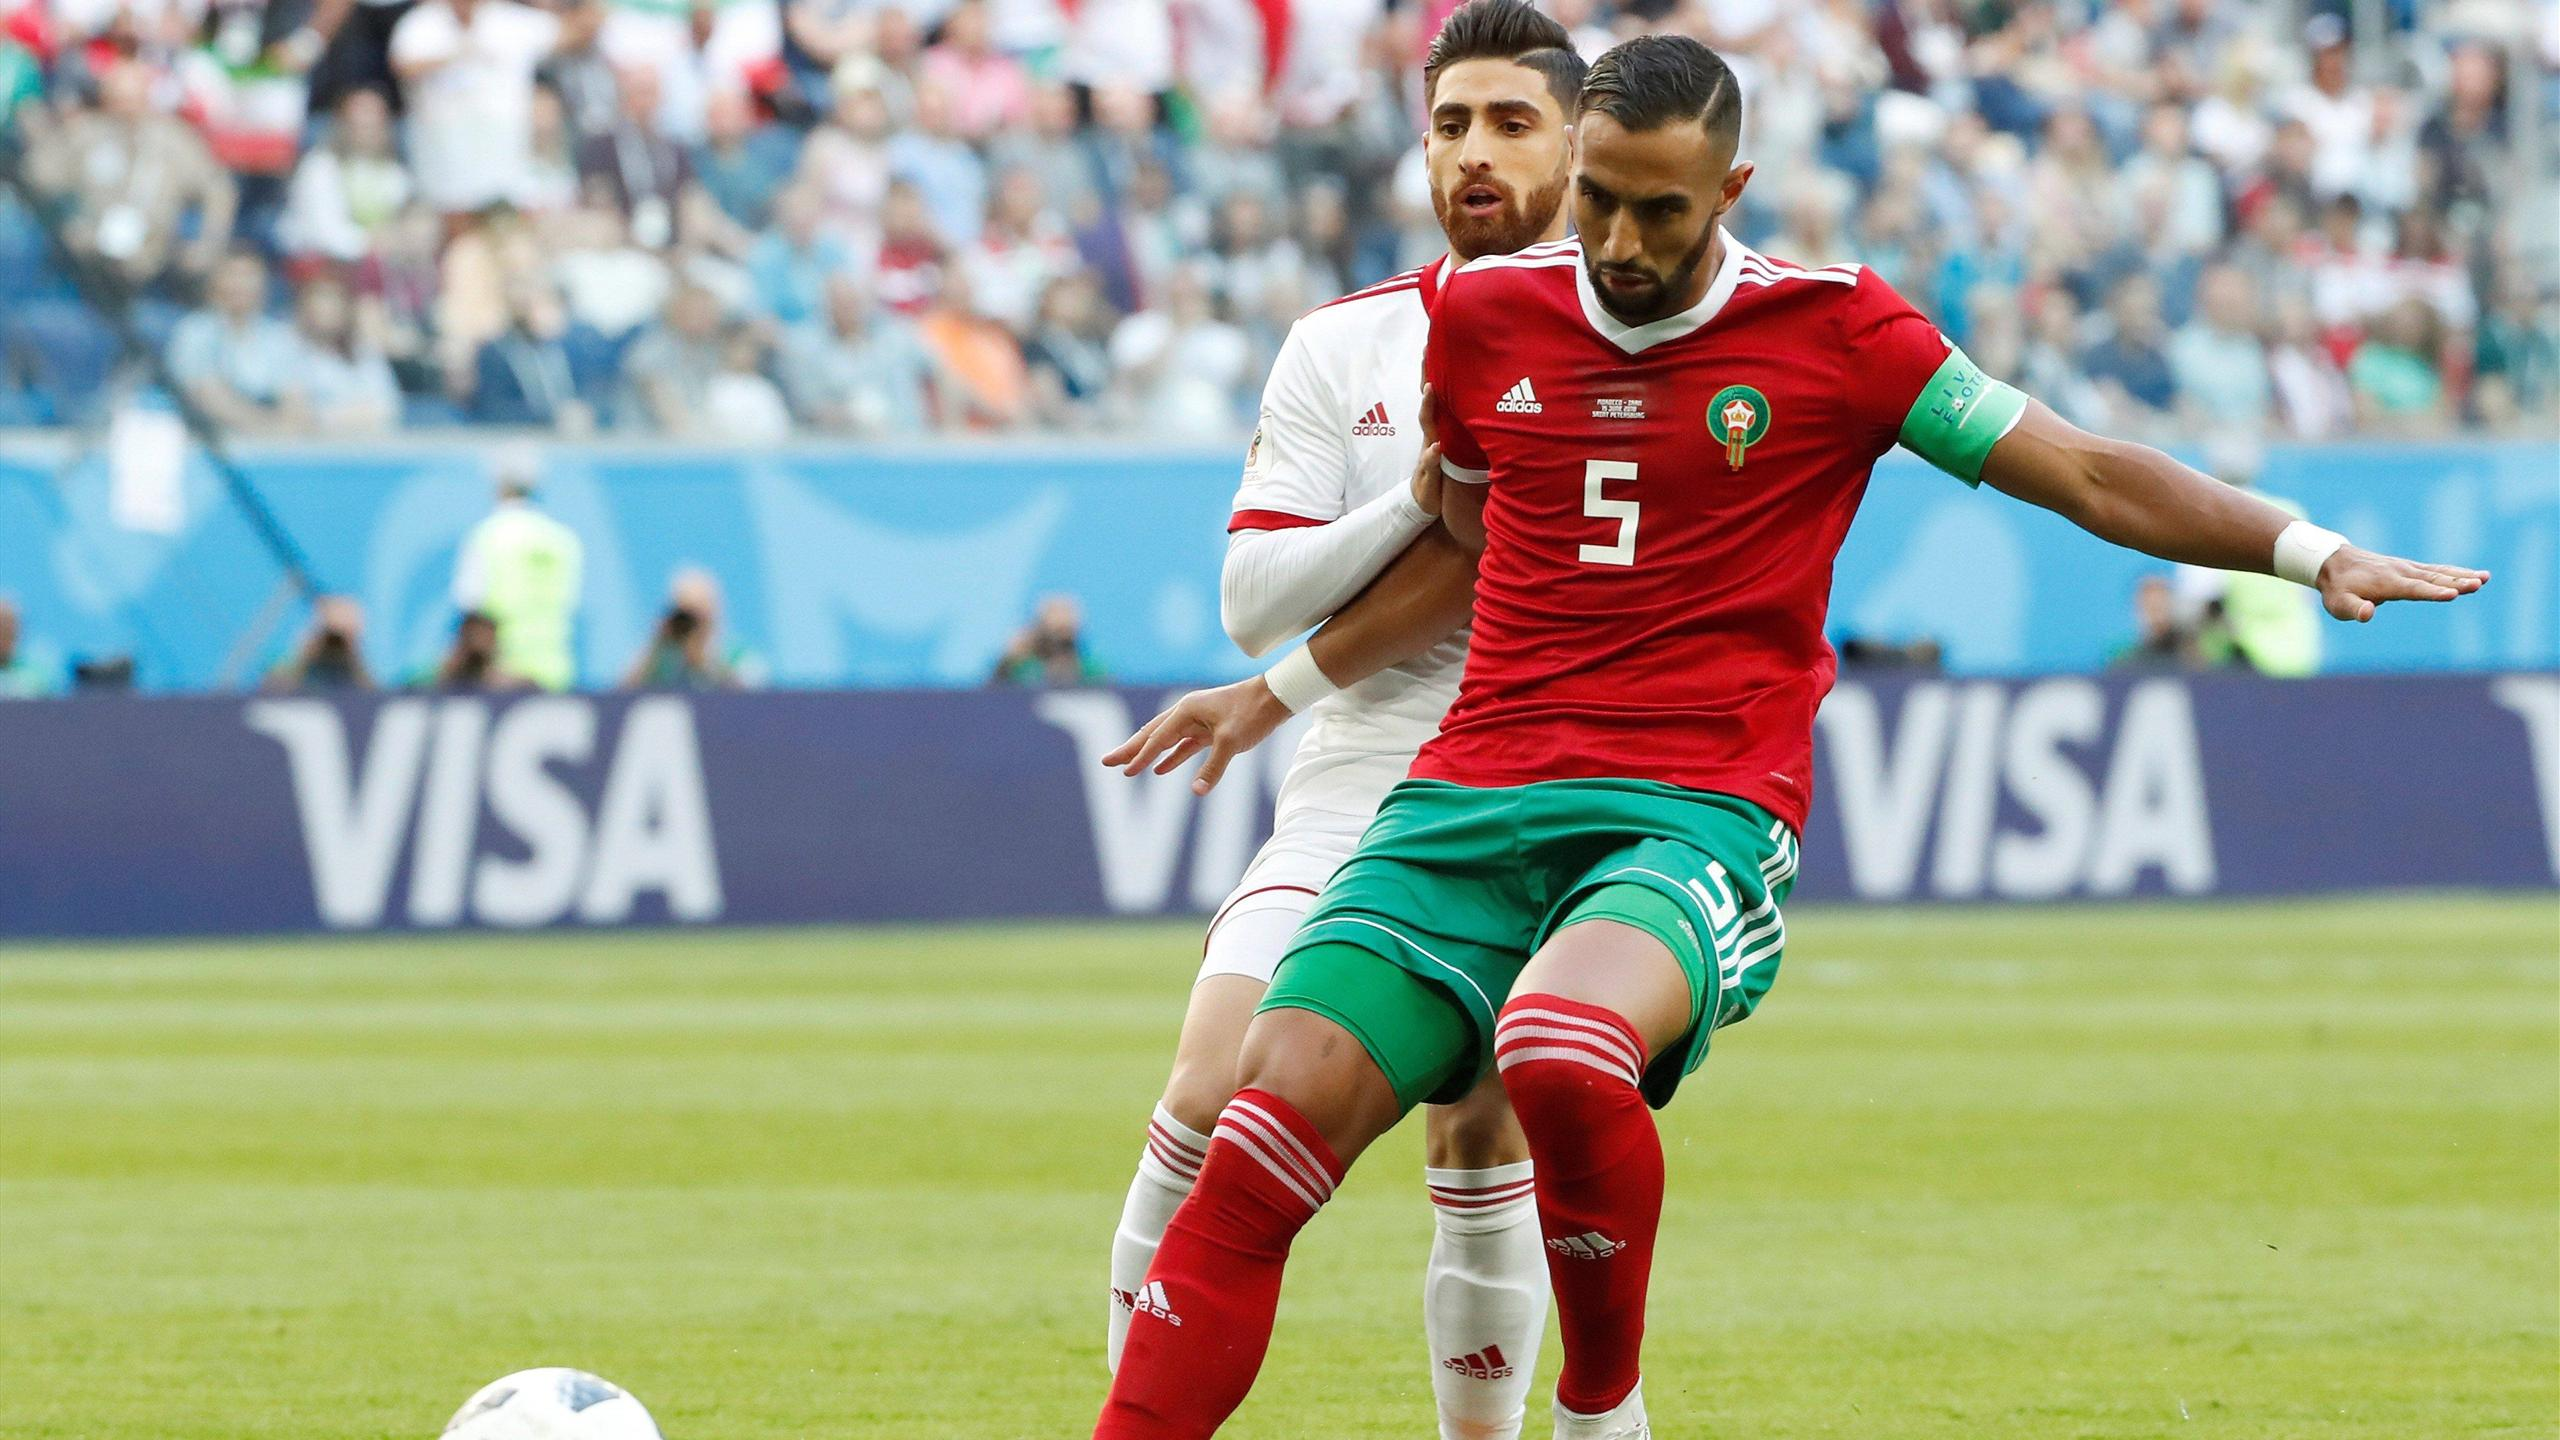 Marokko Spiel Heute